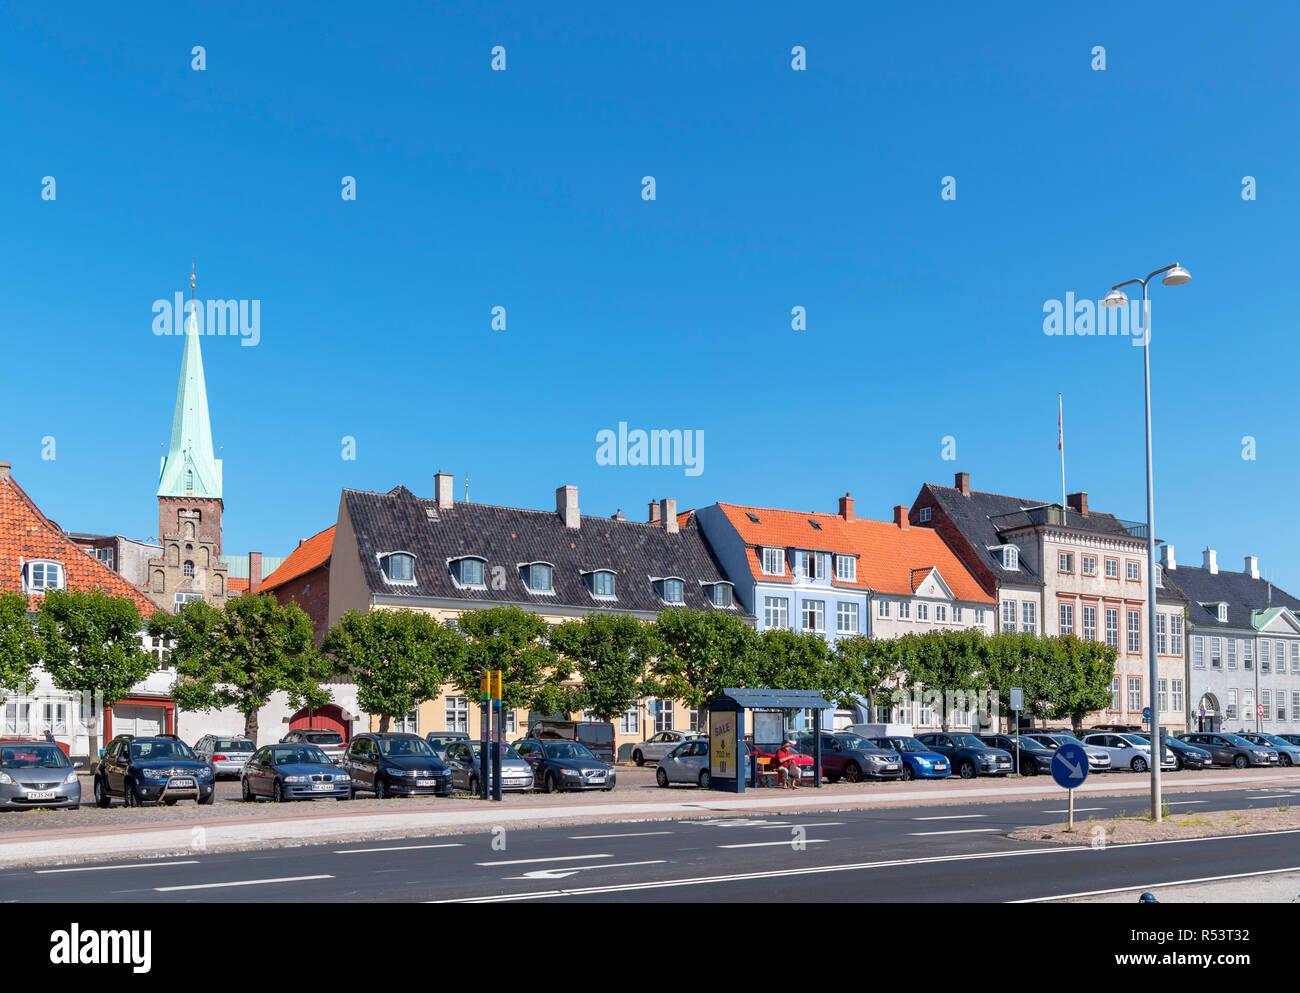 Seafront buildings along Strandgade in the old town centre, Helsingør ( Elsinore ), Zealand, Denmark - Stock Image